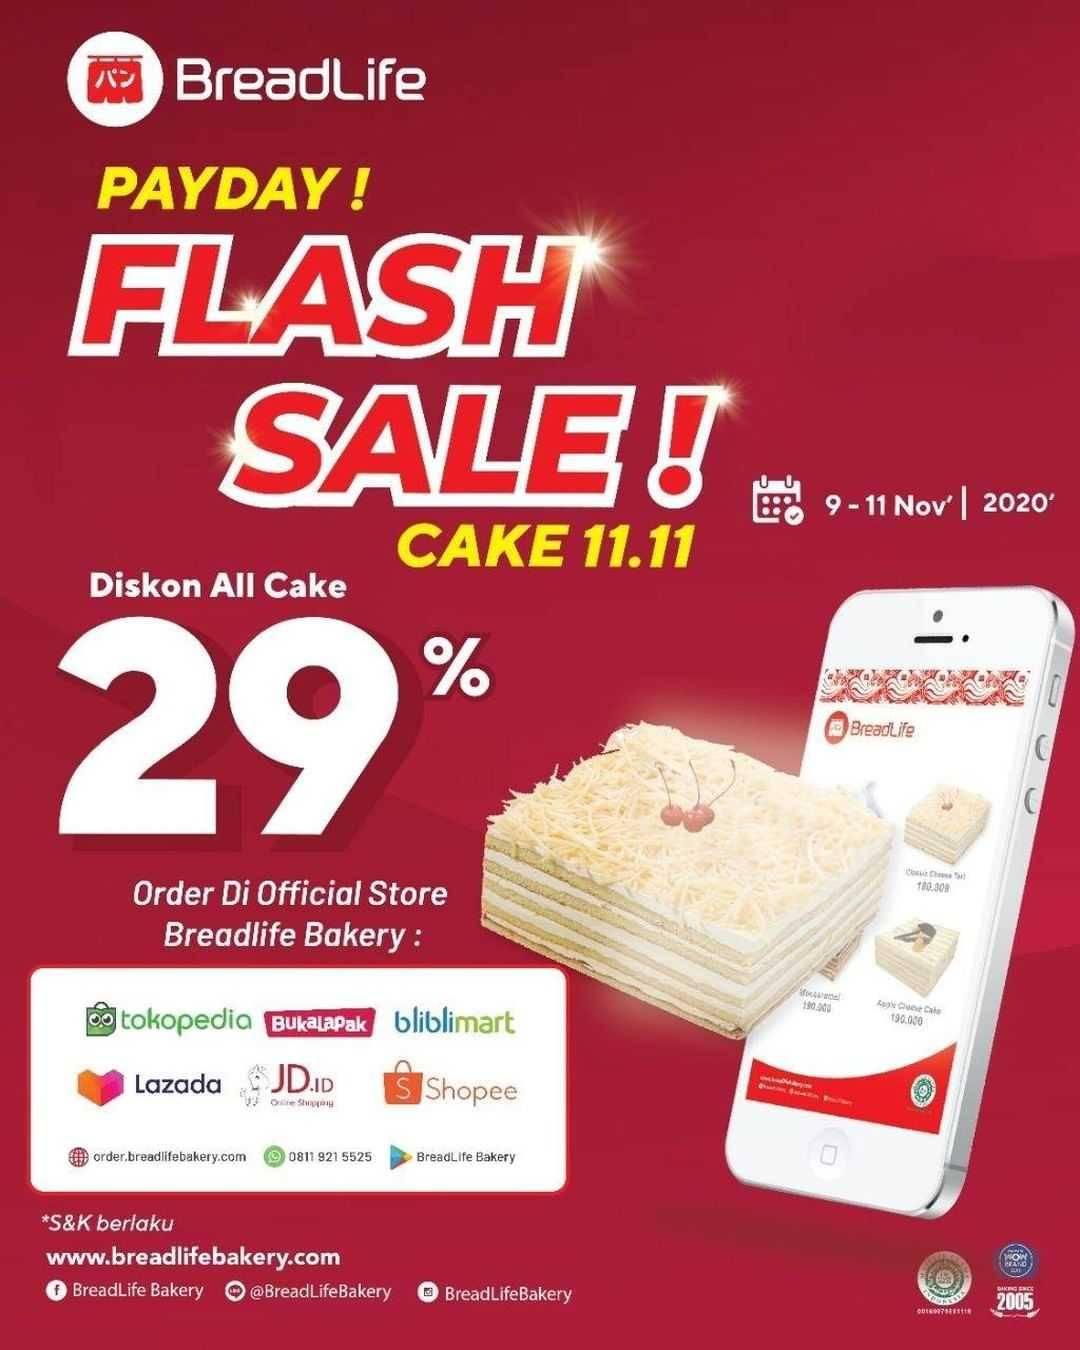 Promo diskon Breadlife Promo Payday Flash Sale - Discount 29% Off On All Cake